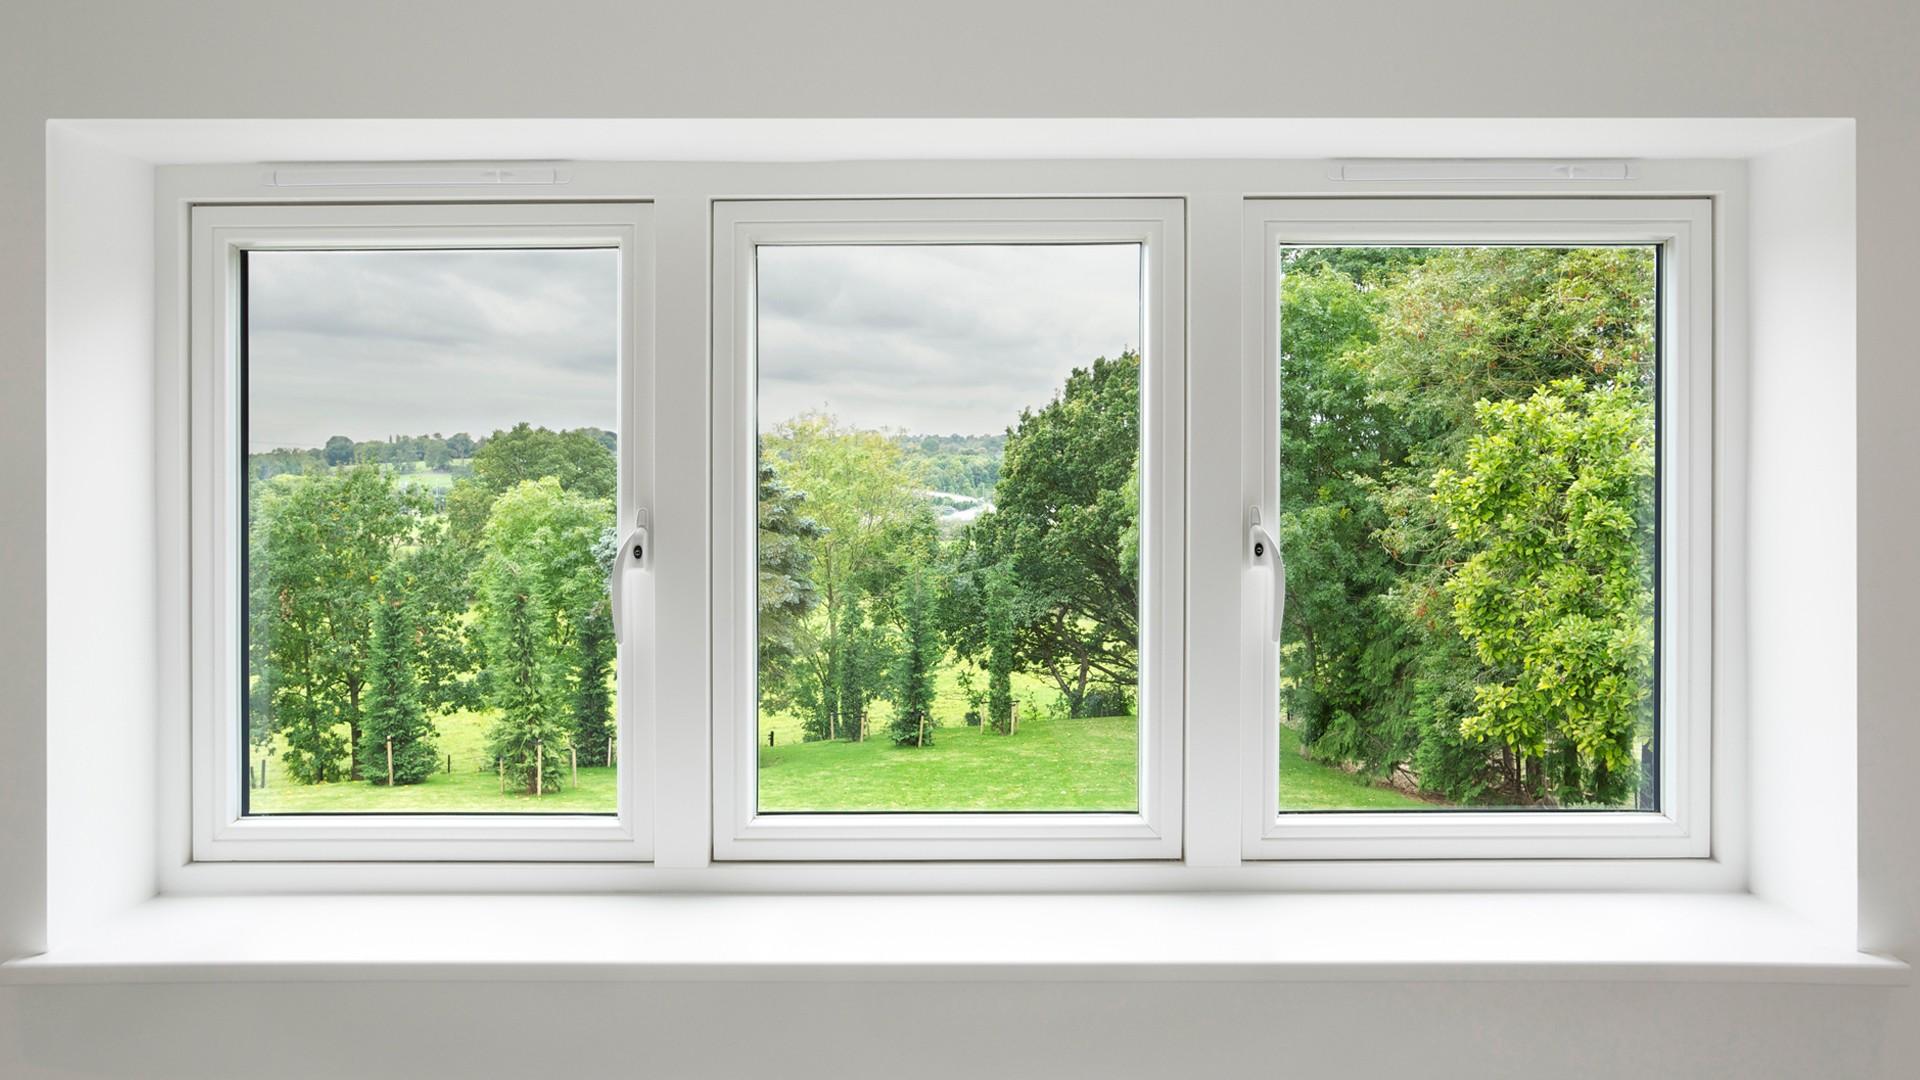 000 aluminio puertas ventanas cerramientos  PVC  (2)